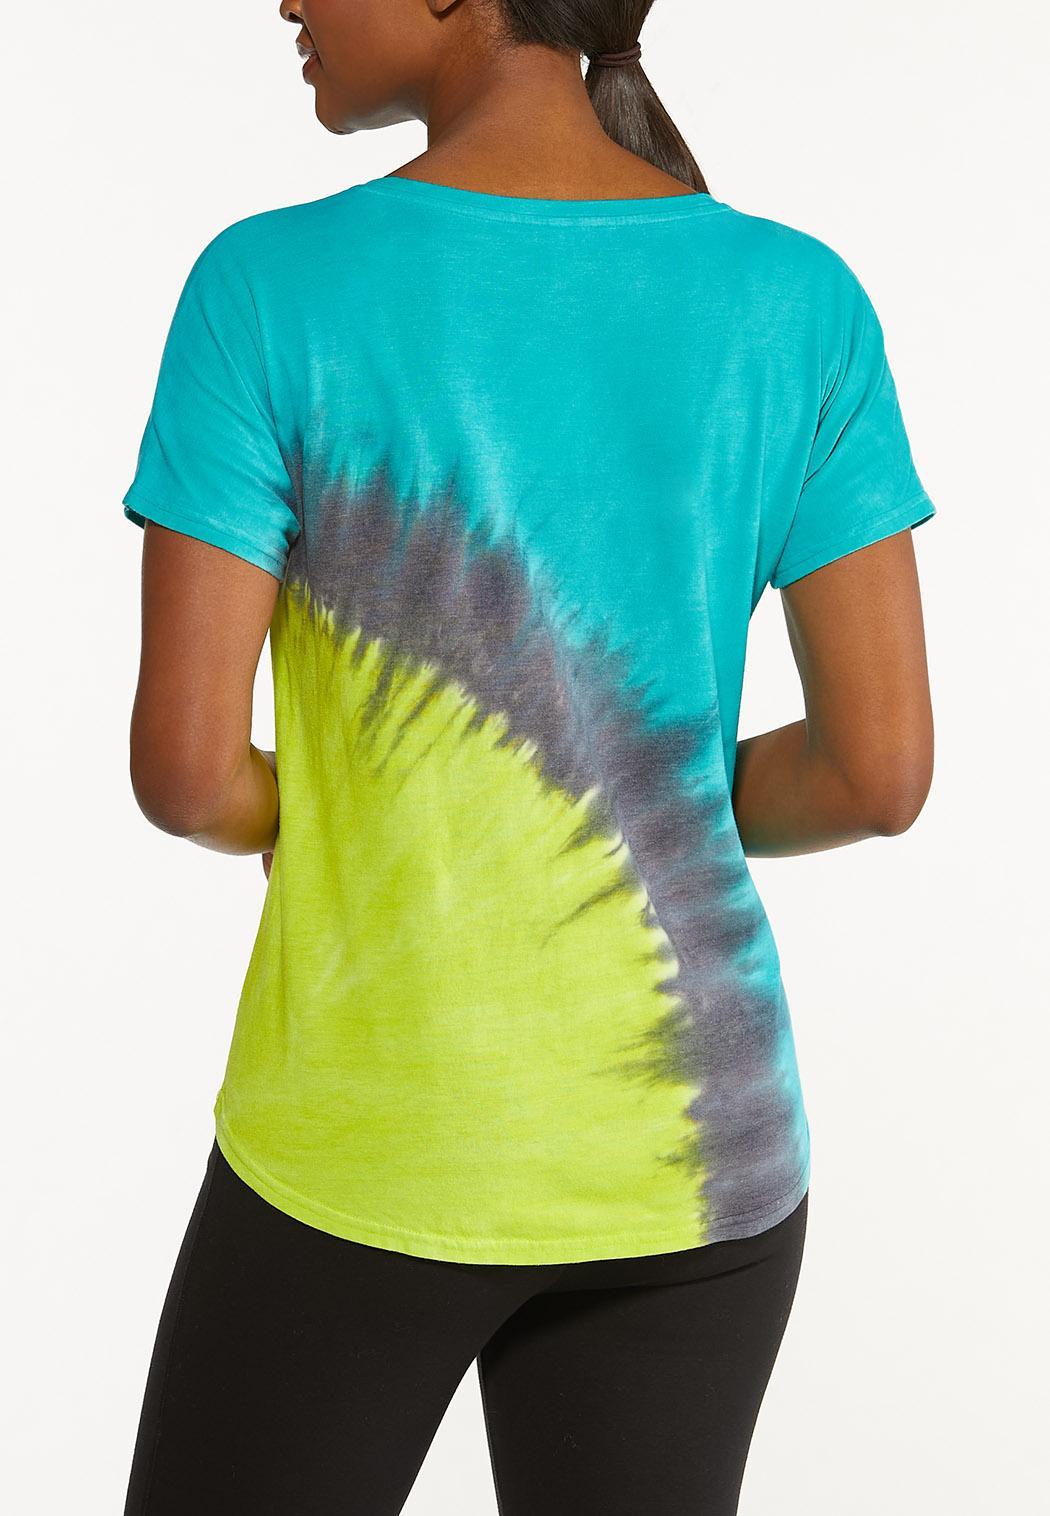 Plus Size Tie Dye Tee Shirt (Item #44567866)